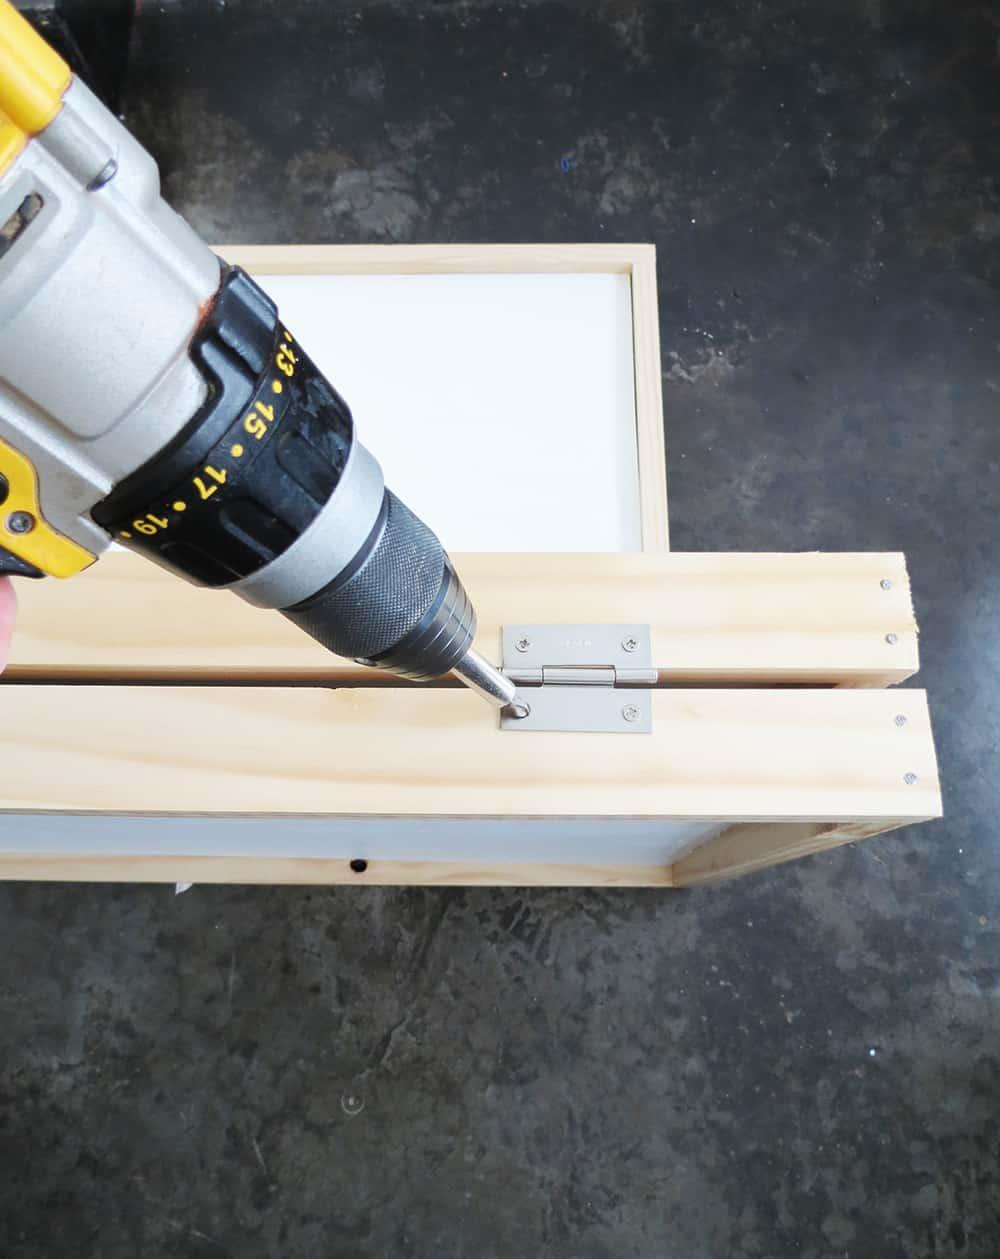 screwing room divider hinges